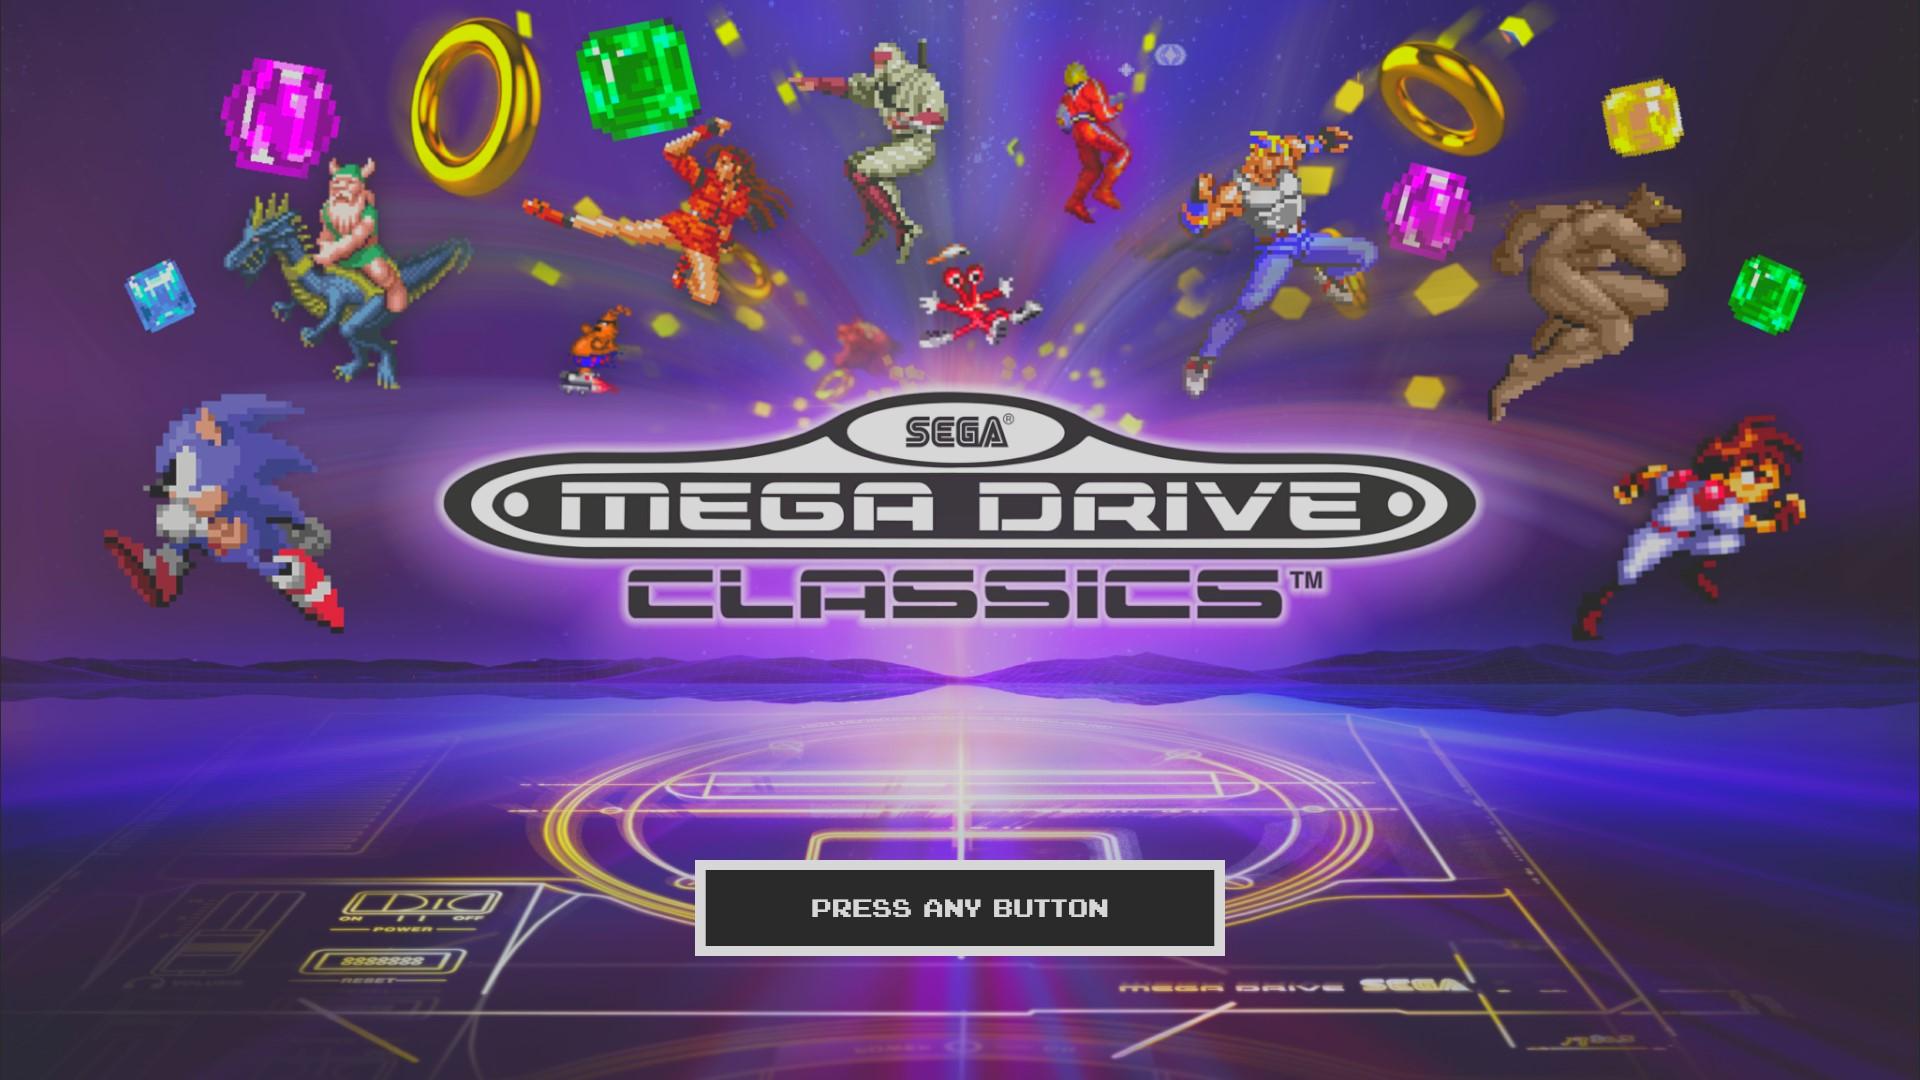 AkinNahtanoj: SEGA Genesis/Mega Drive Classics Volume 3: Alien Storm [Arcade Mode] (PC) 24 points on 2020-08-18 16:06:20